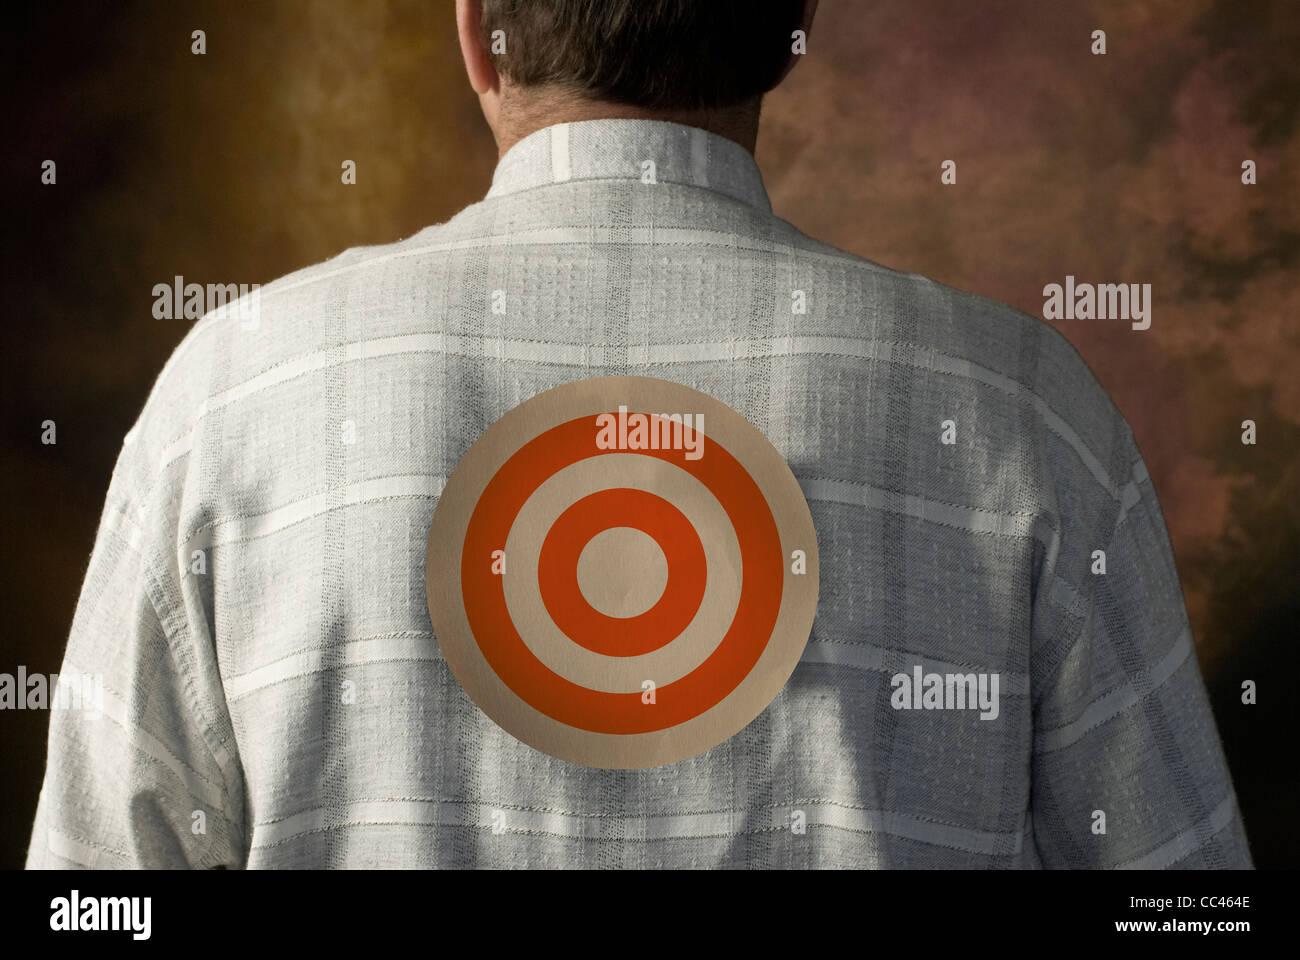 target on man's back - Stock Image